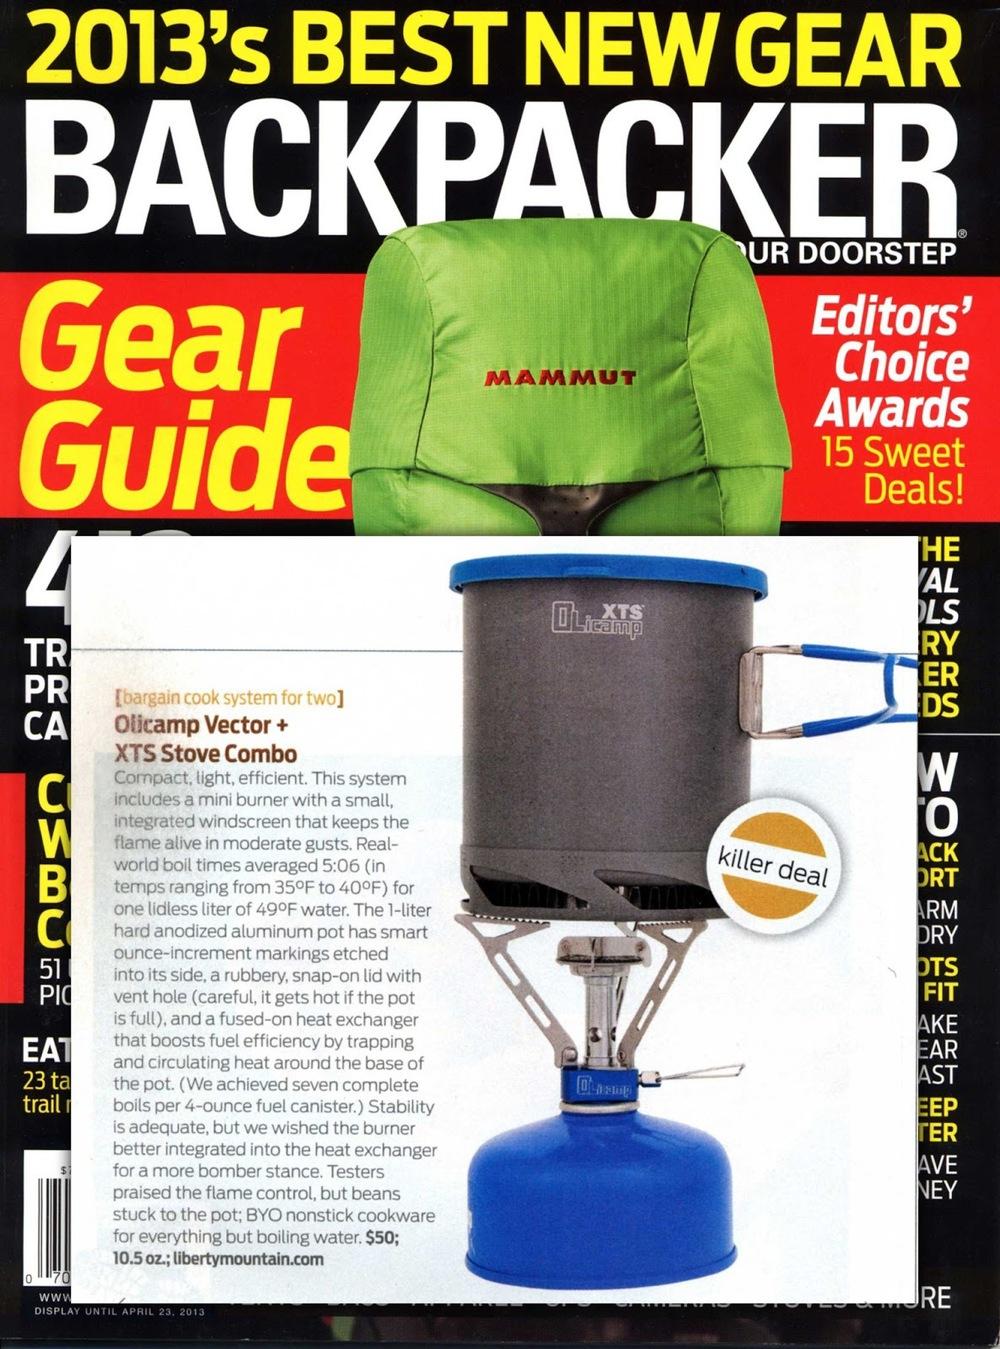 Backpacker-Gear-Guide-Vector.jpg